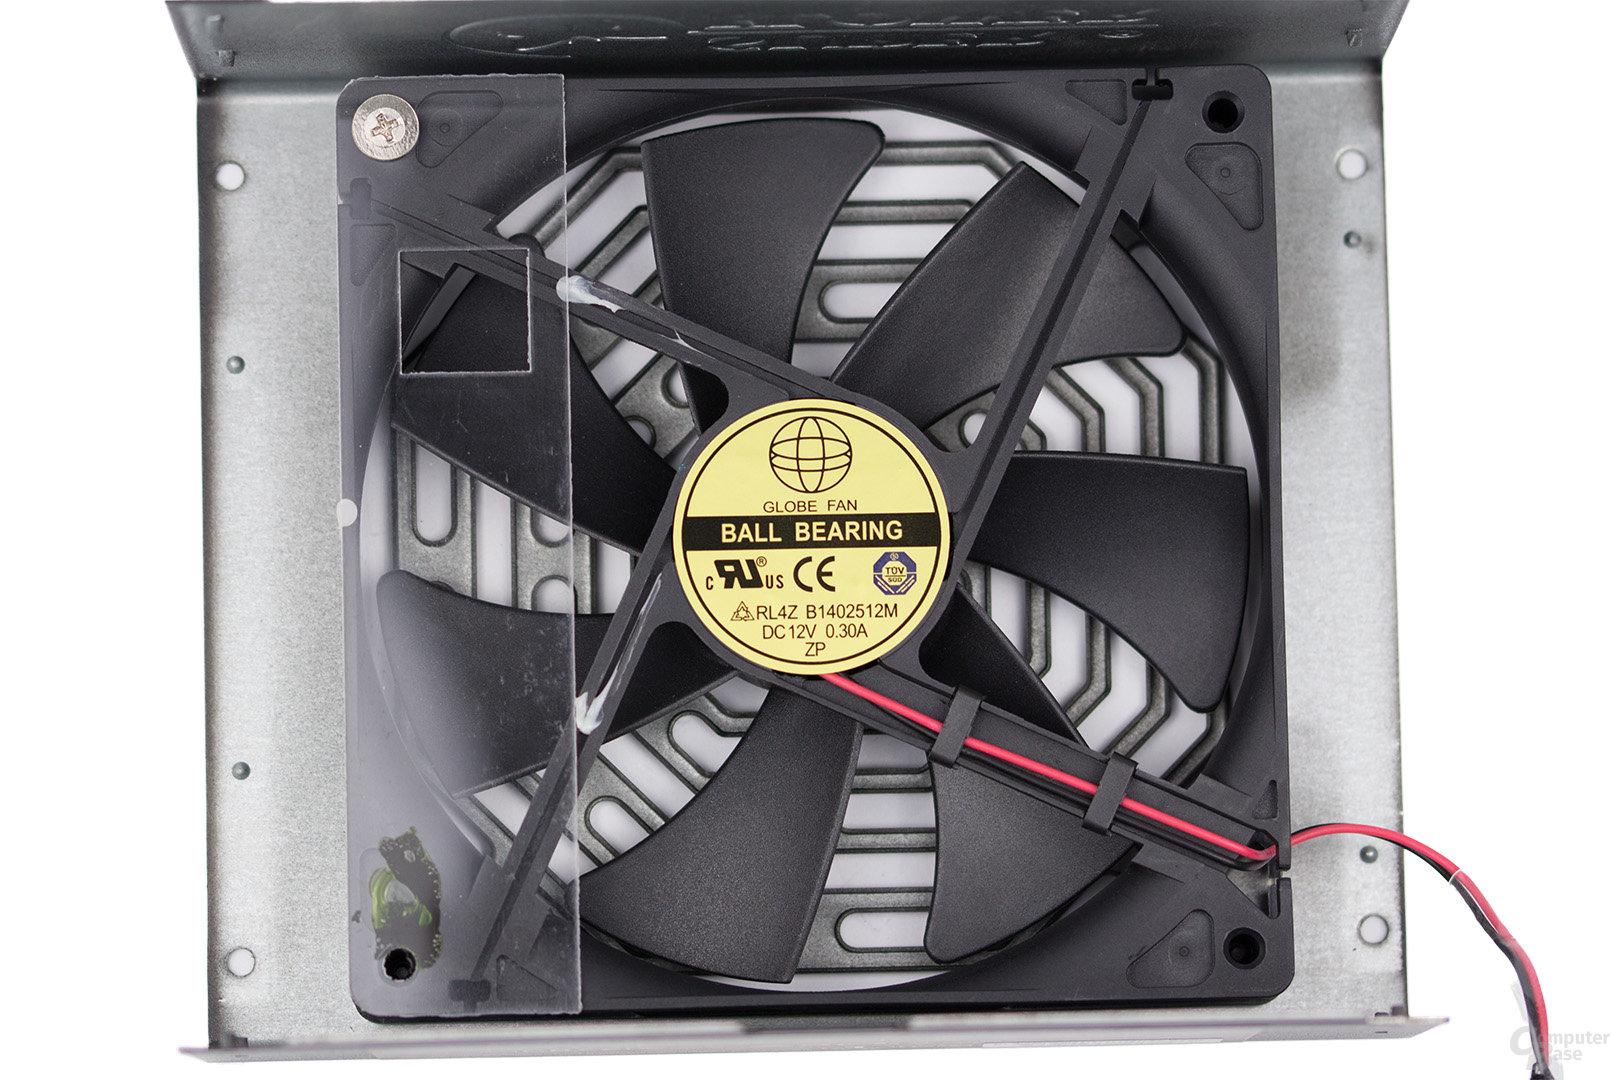 Super Flower Leadex Titanium 850W – Lüfter